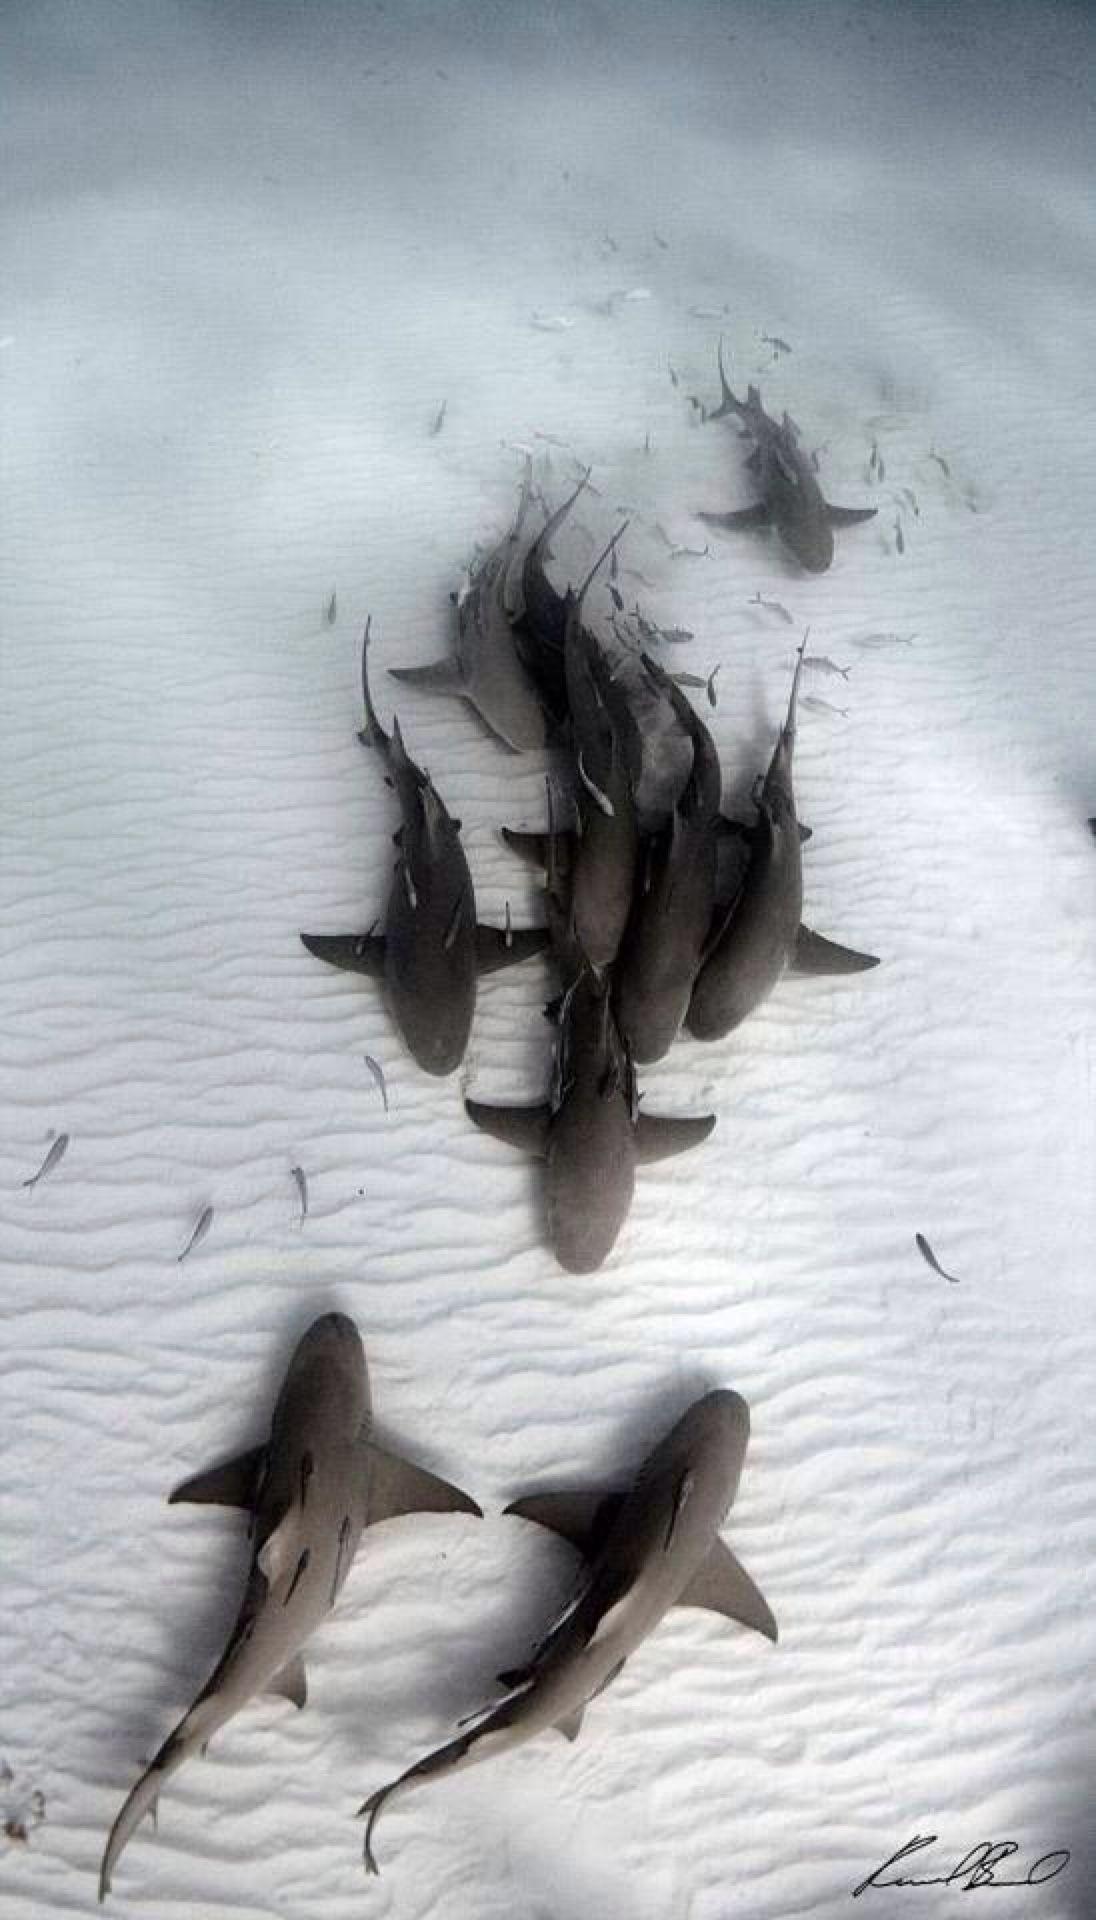 Africa Moon Ocean Animals Shark Animals